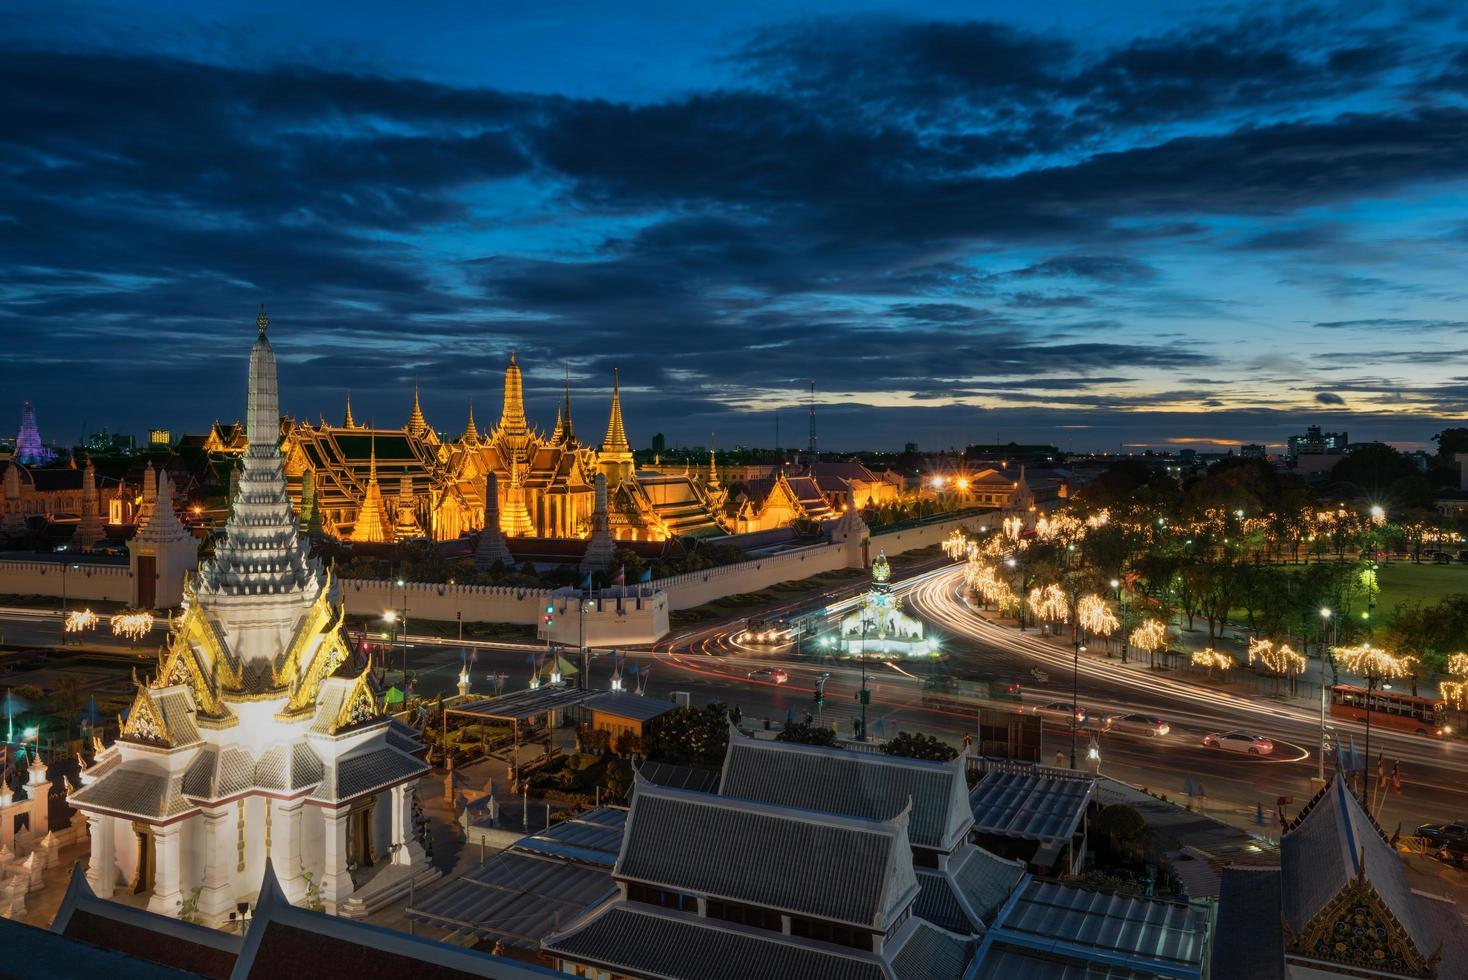 The Emerald Buddha Temple at twilight photo